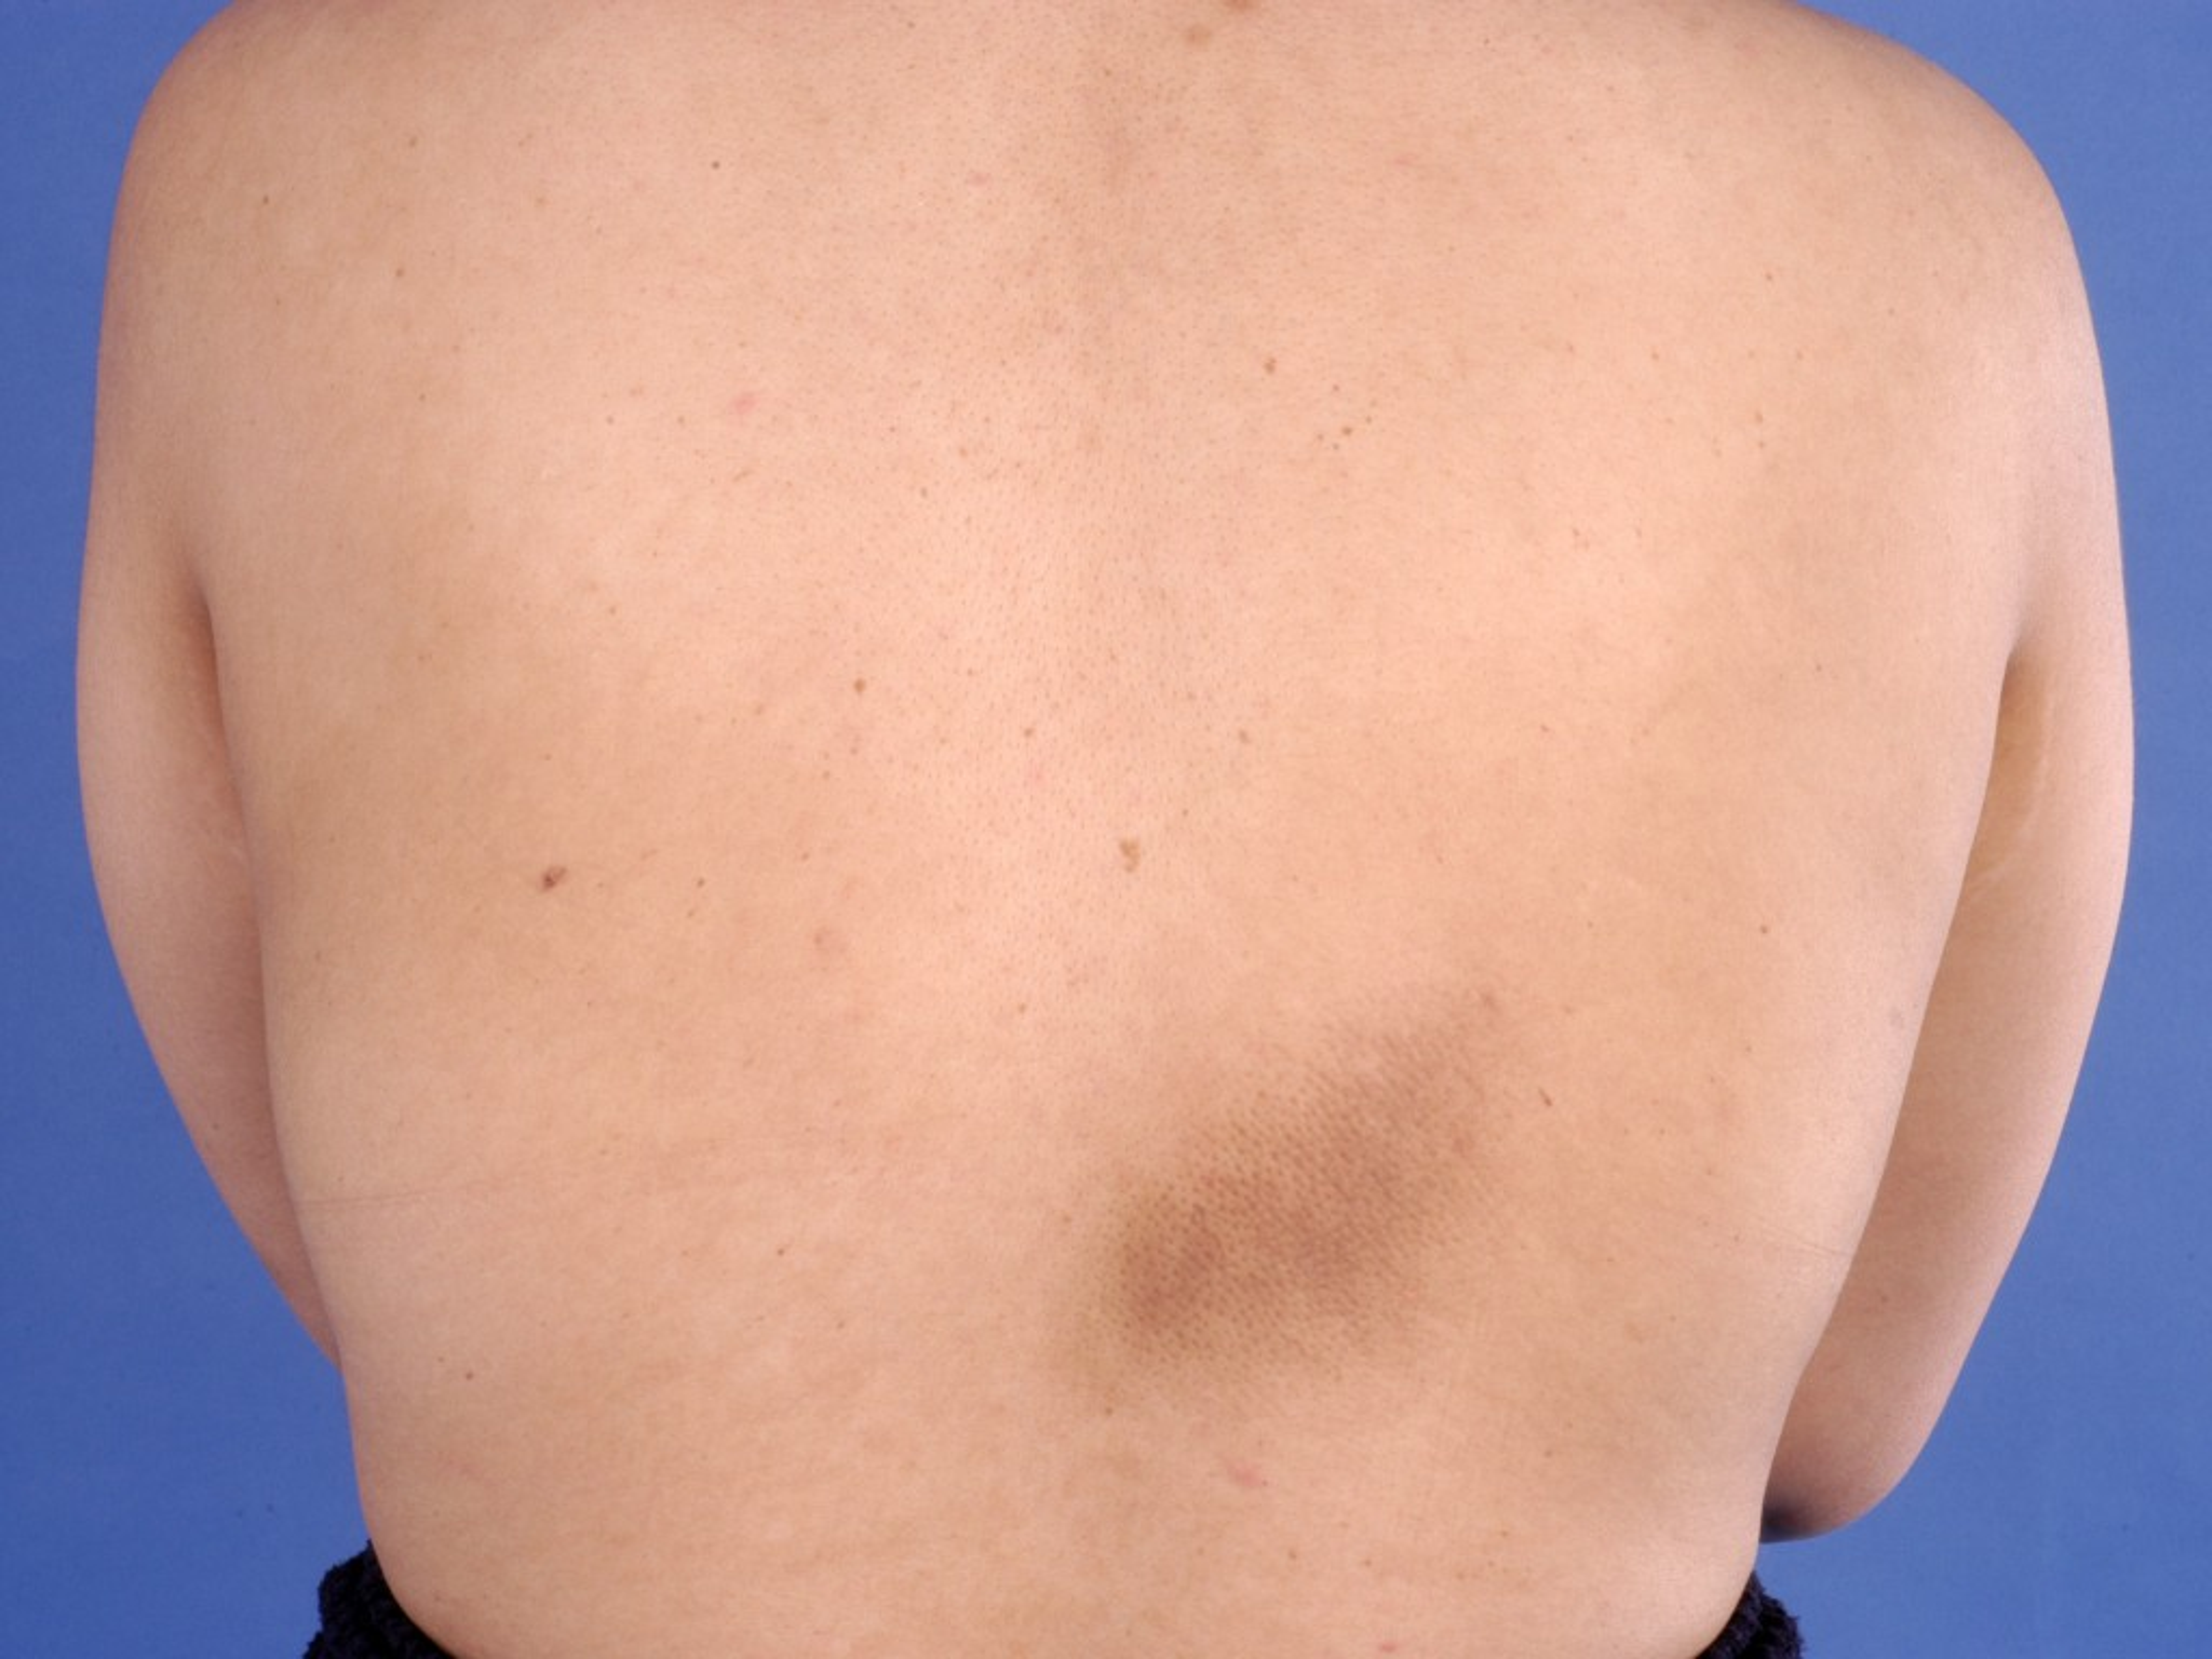 Lichen simplex chronicus en prurigo nodularis - Medicinfo